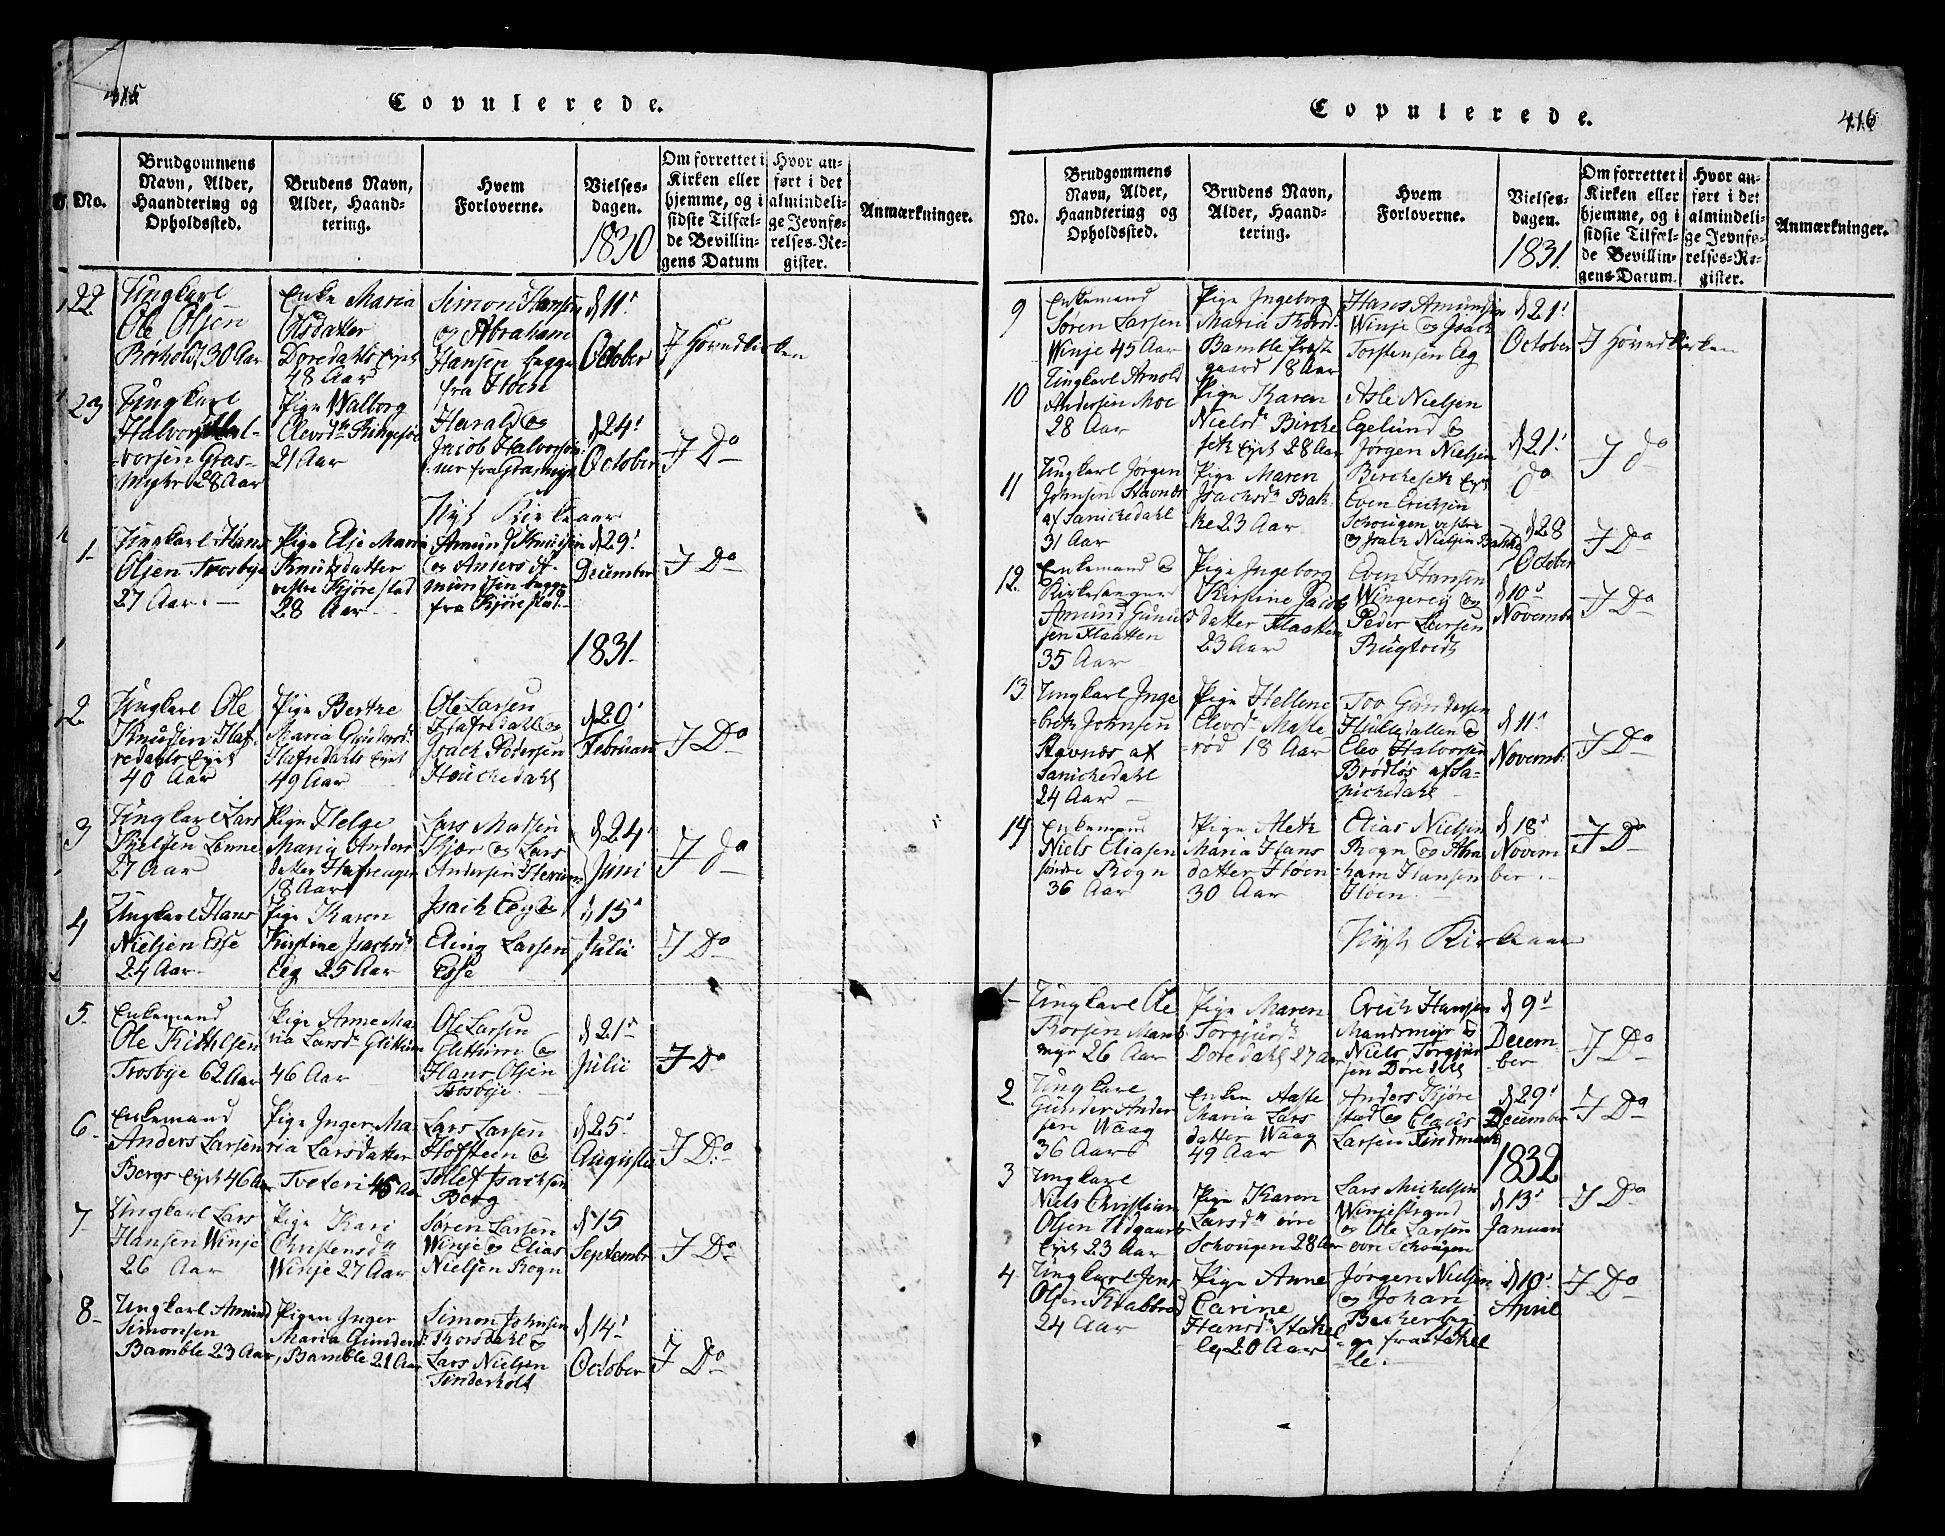 SAKO, Bamble kirkebøker, F/Fa/L0003: Ministerialbok nr. I 3 /1, 1814-1834, s. 415-416